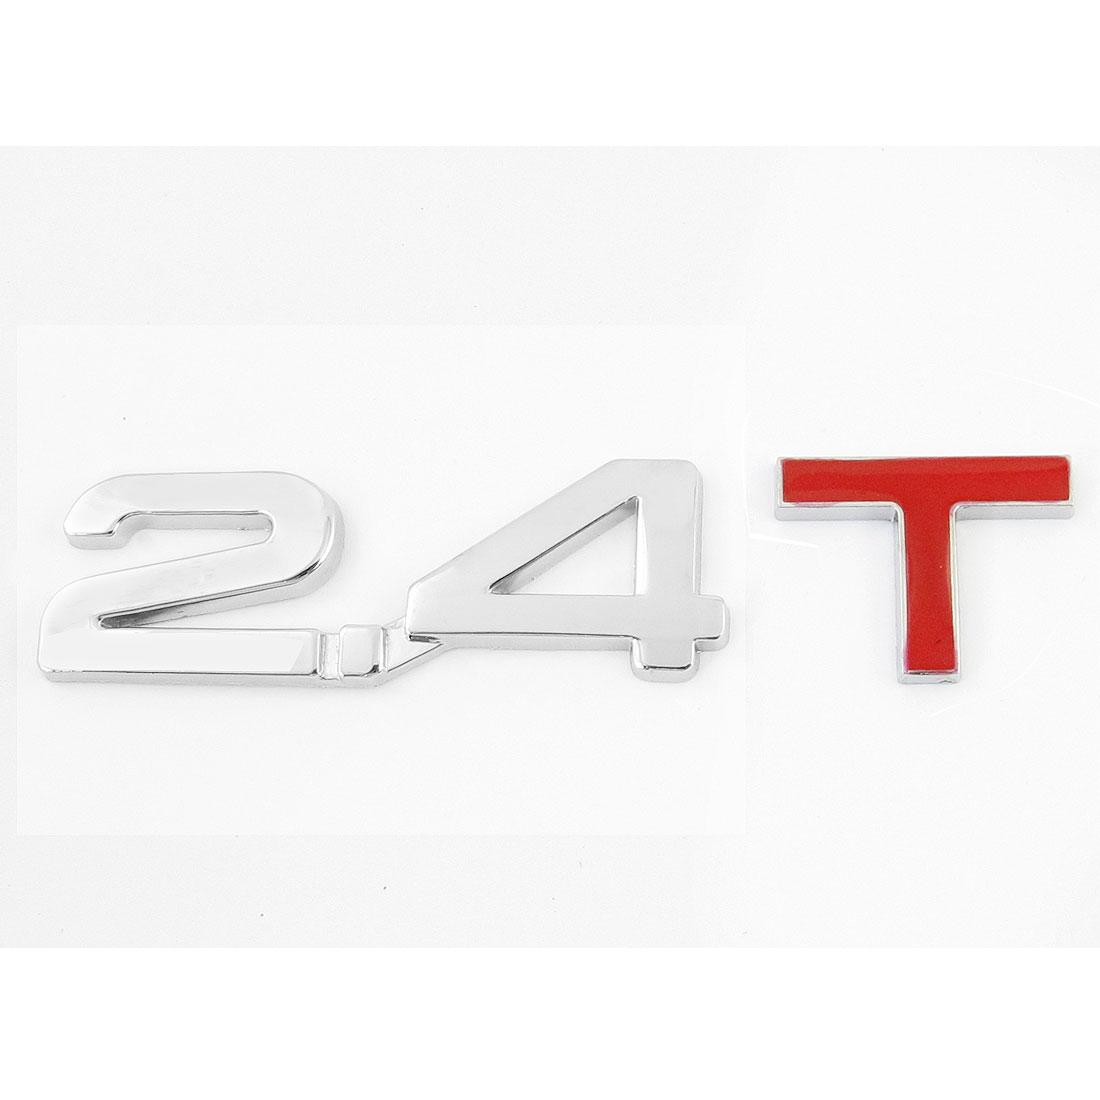 2.4T Metal Shape Car Auto Badge Sticker Emblem Ornament Silver Tone